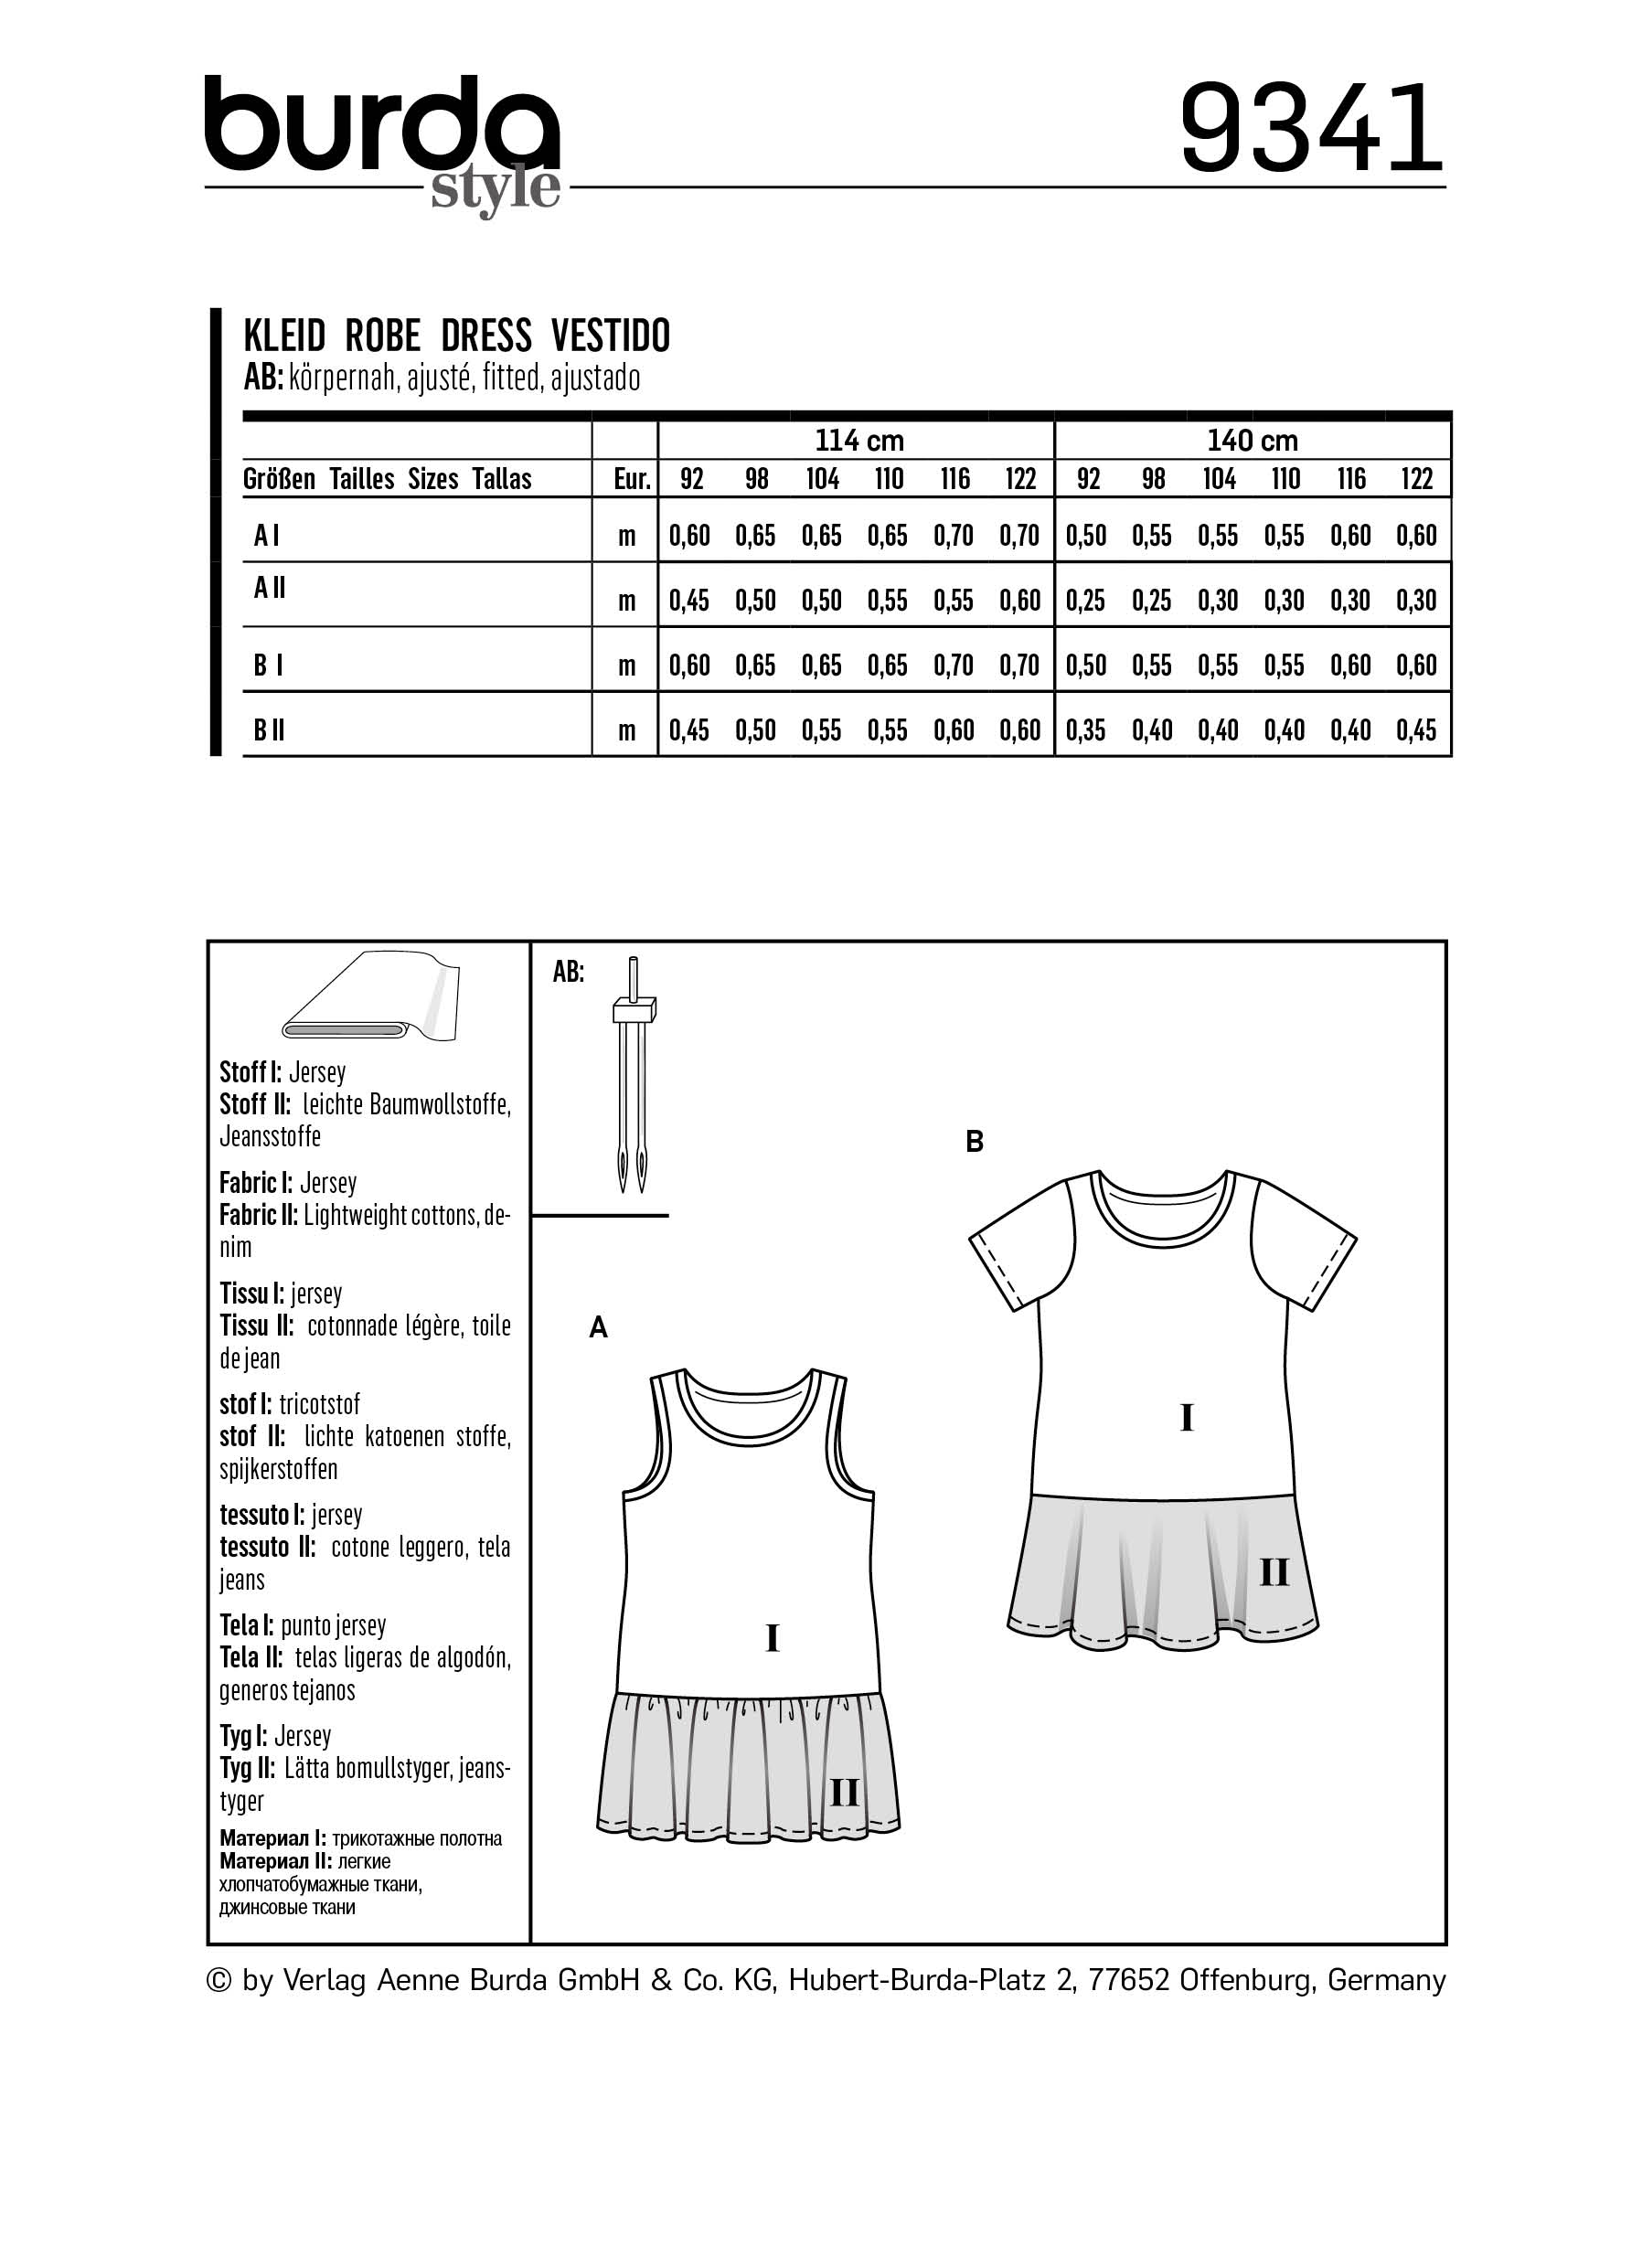 Girls\' dresses, Burda 9341 | 92 - 122 - baby-sewing ...